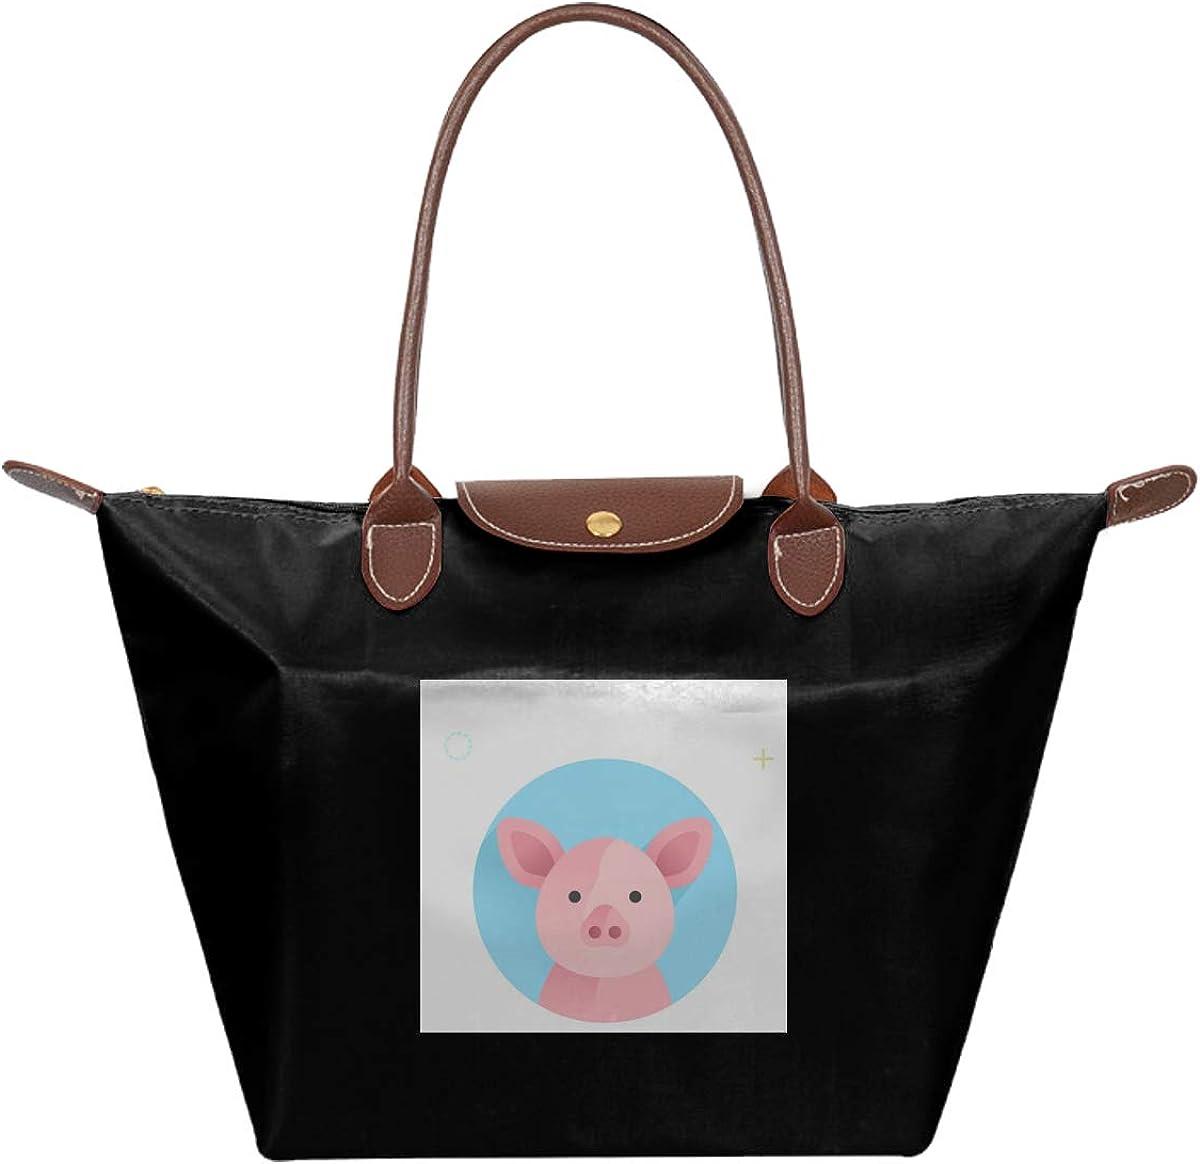 Lovely Pink Pig Watercolor PU Folding Dumpling Bag Tote Bag Large Women Casual Shoulder Bag Handbag